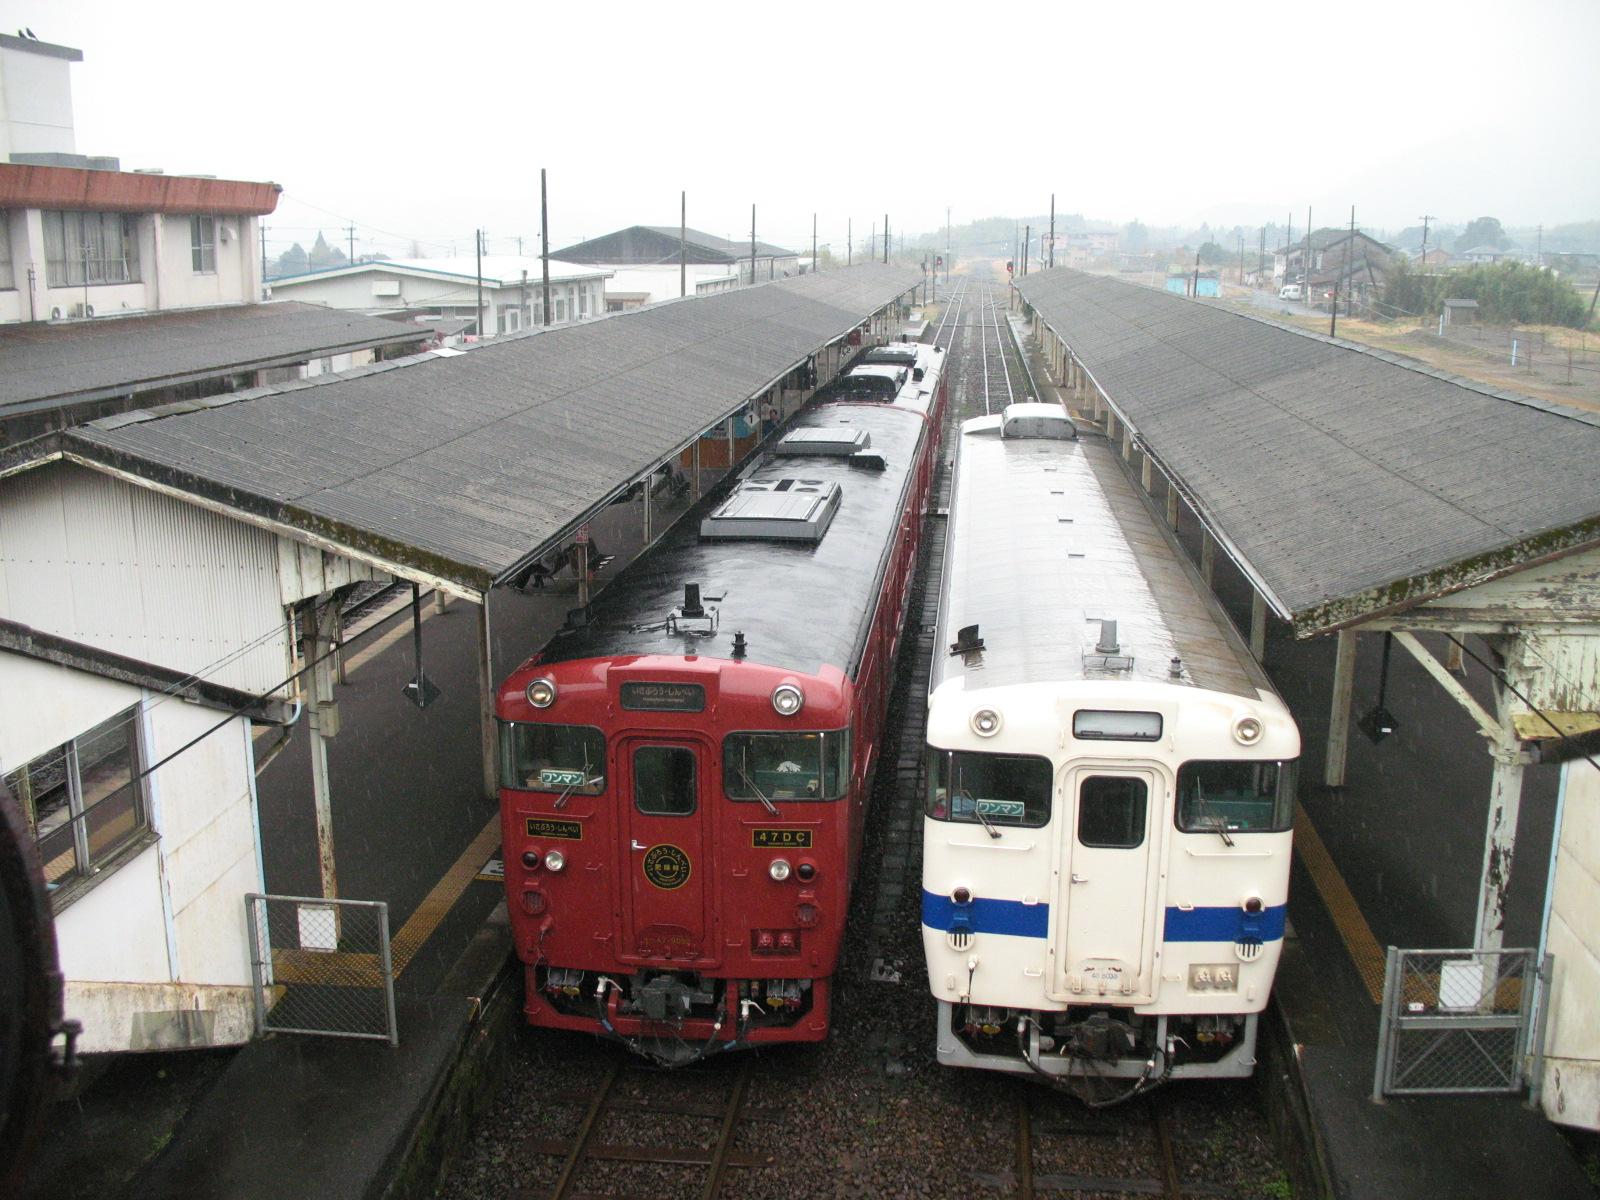 My trip from Kumamoto to Kagoshima-chuo on March 16, 2012 by Kumagawa, Isaburo and Hayato no Kaze